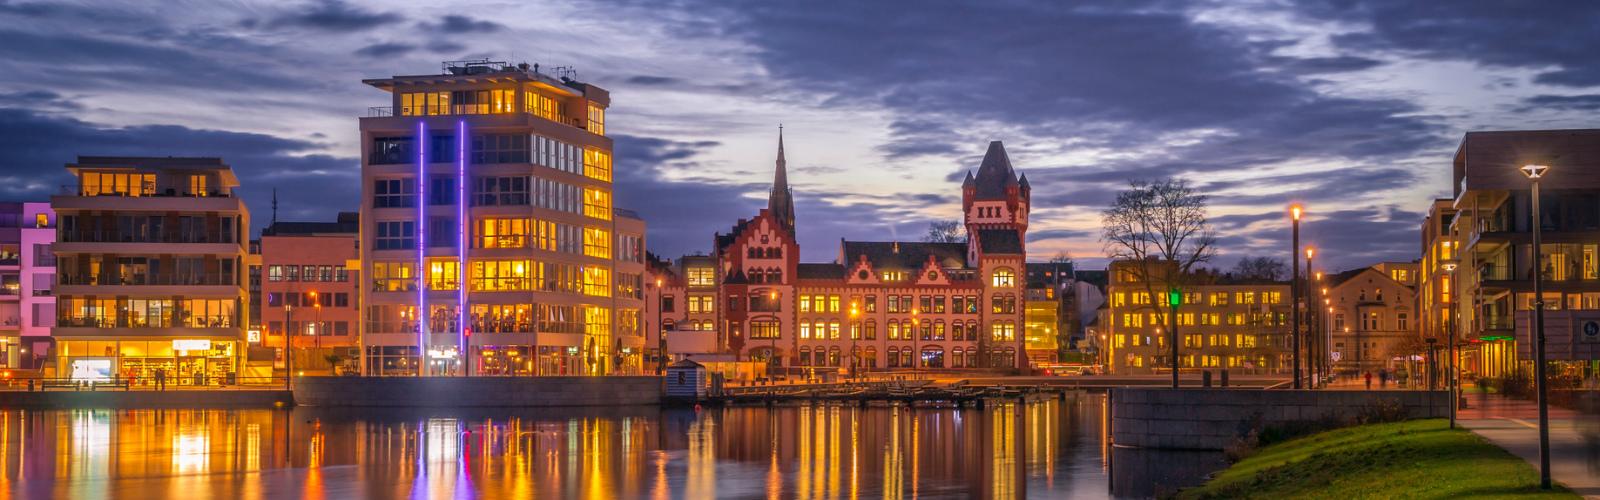 Vakantie Dortmund